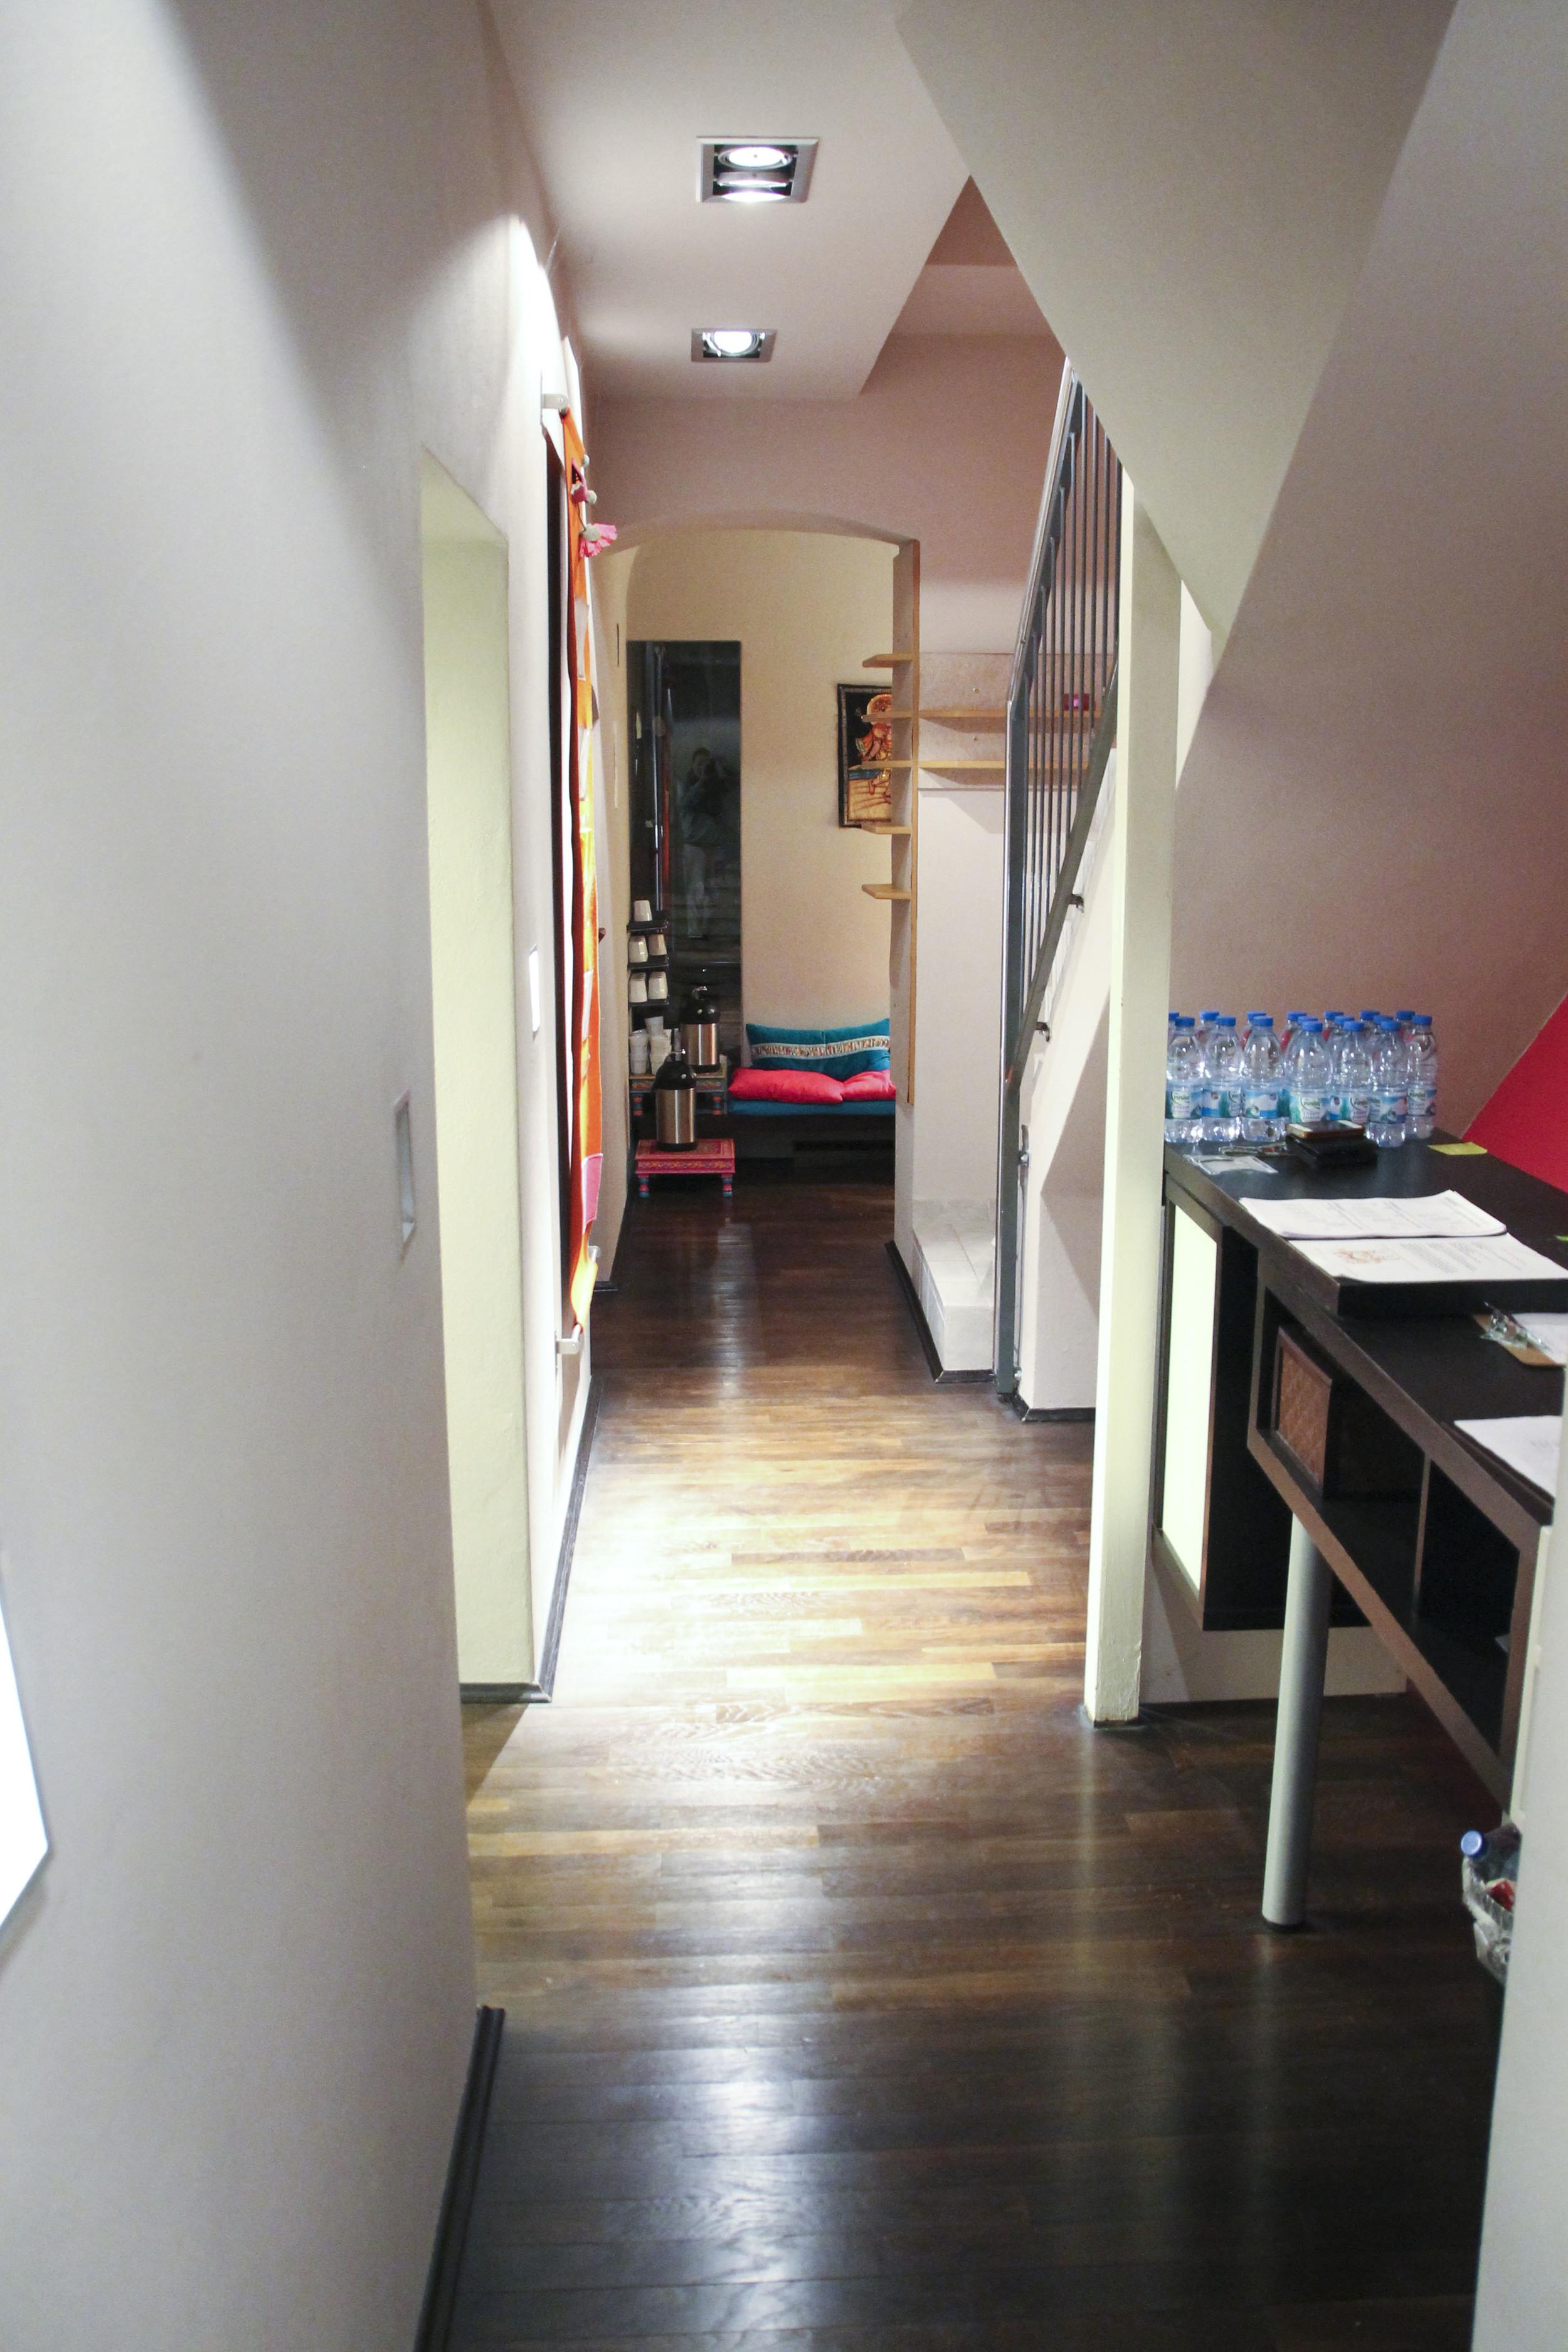 yoga studio werkstatt7 München760.jpg